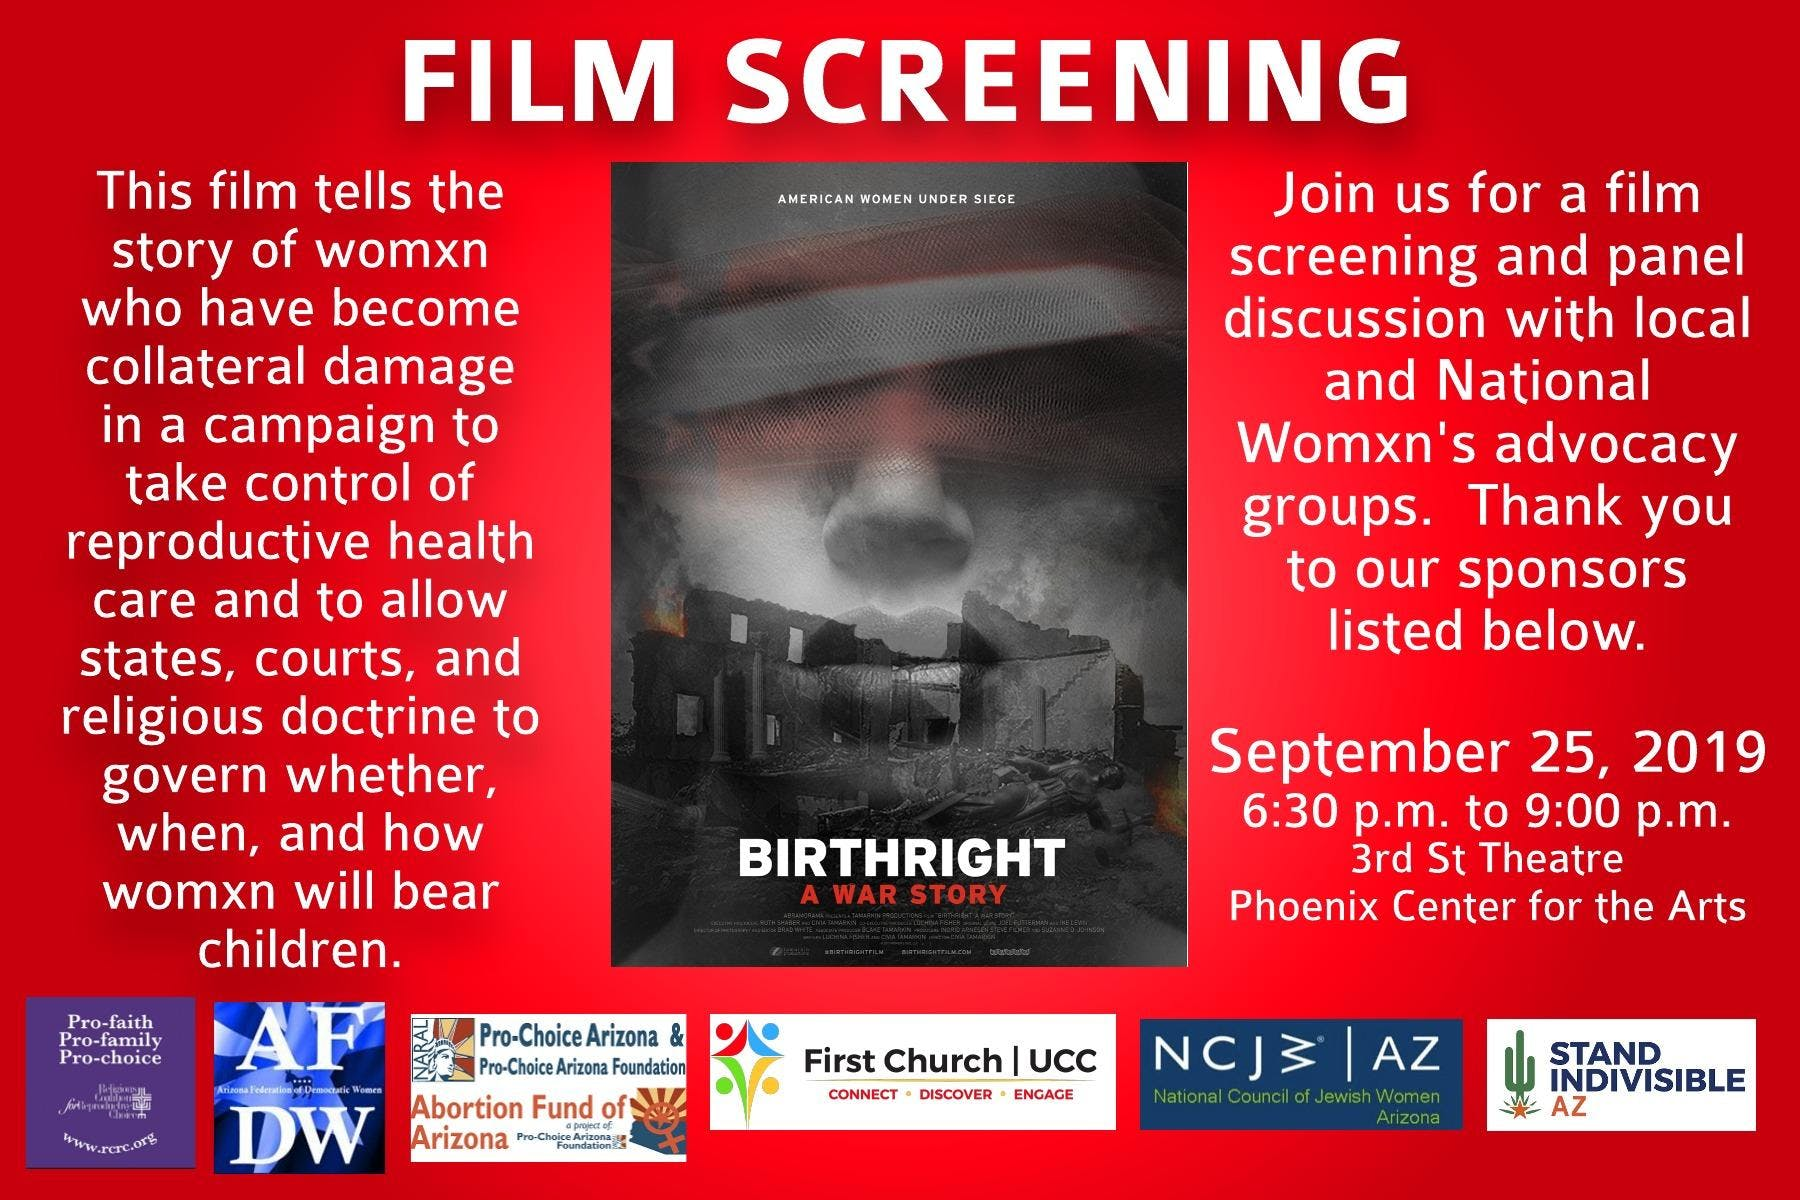 Birthright Film Screening & Conversation